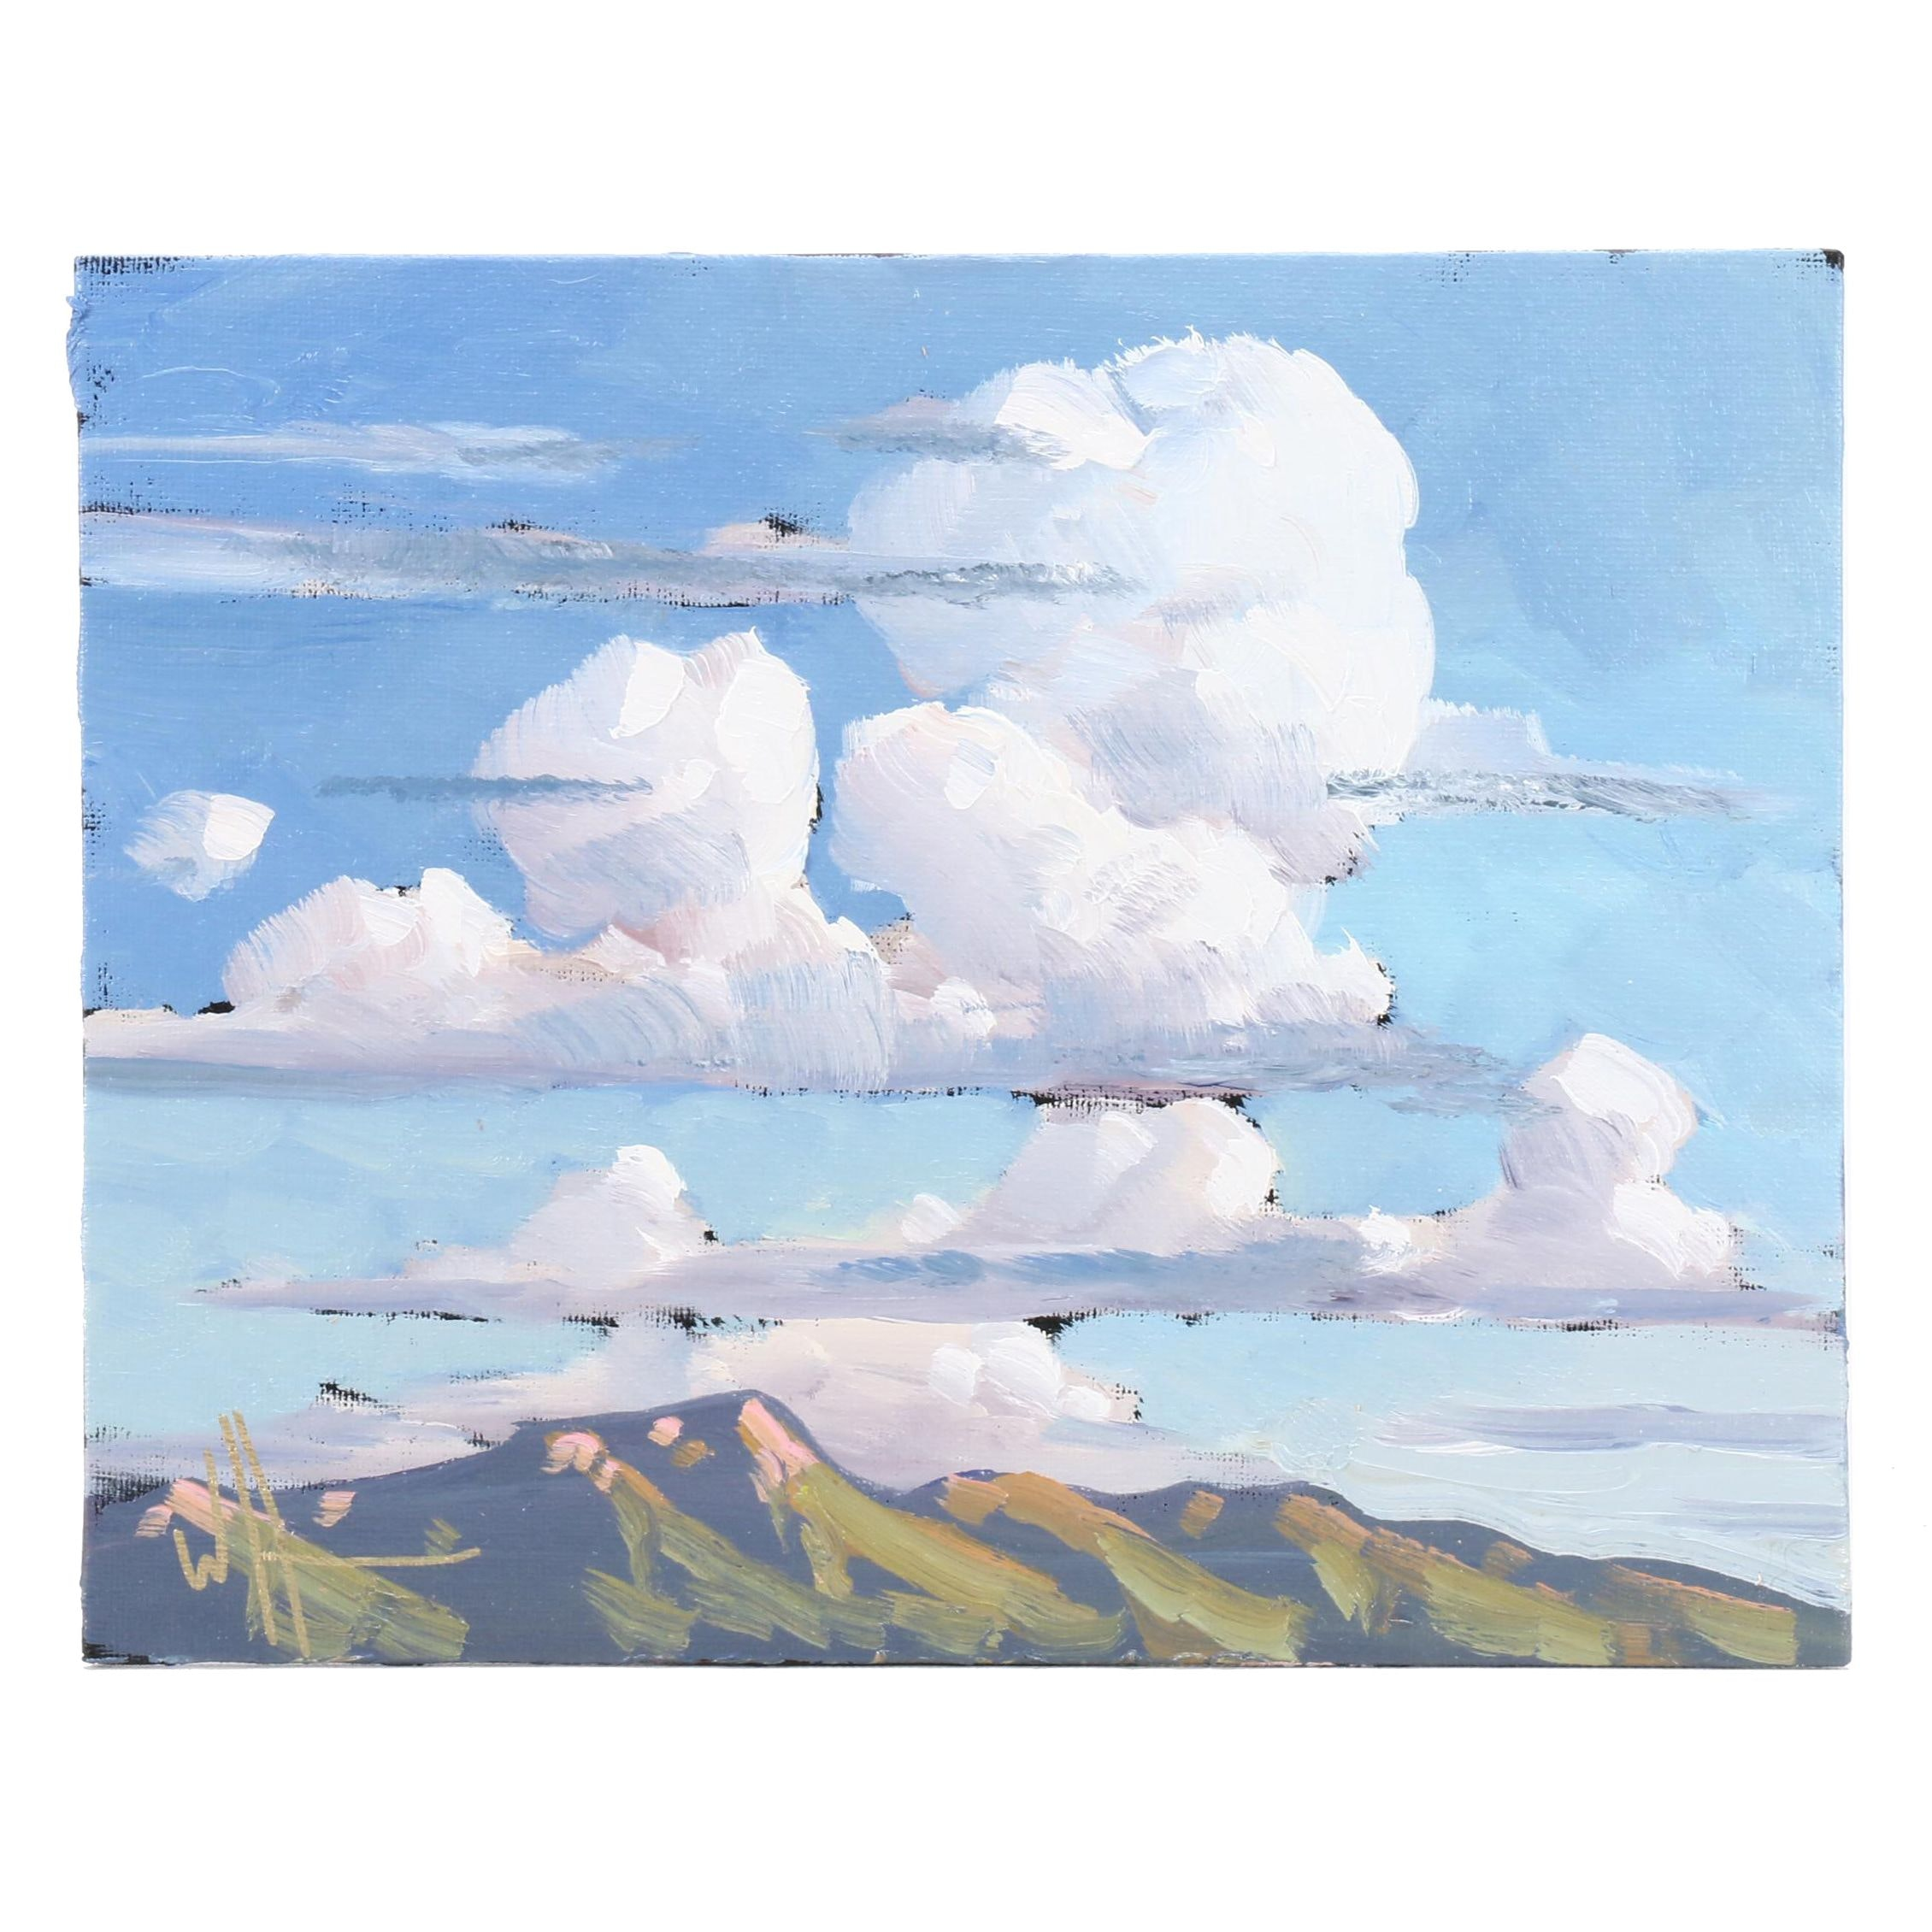 William Hawkins Oil Painting of Big Sky Landscape